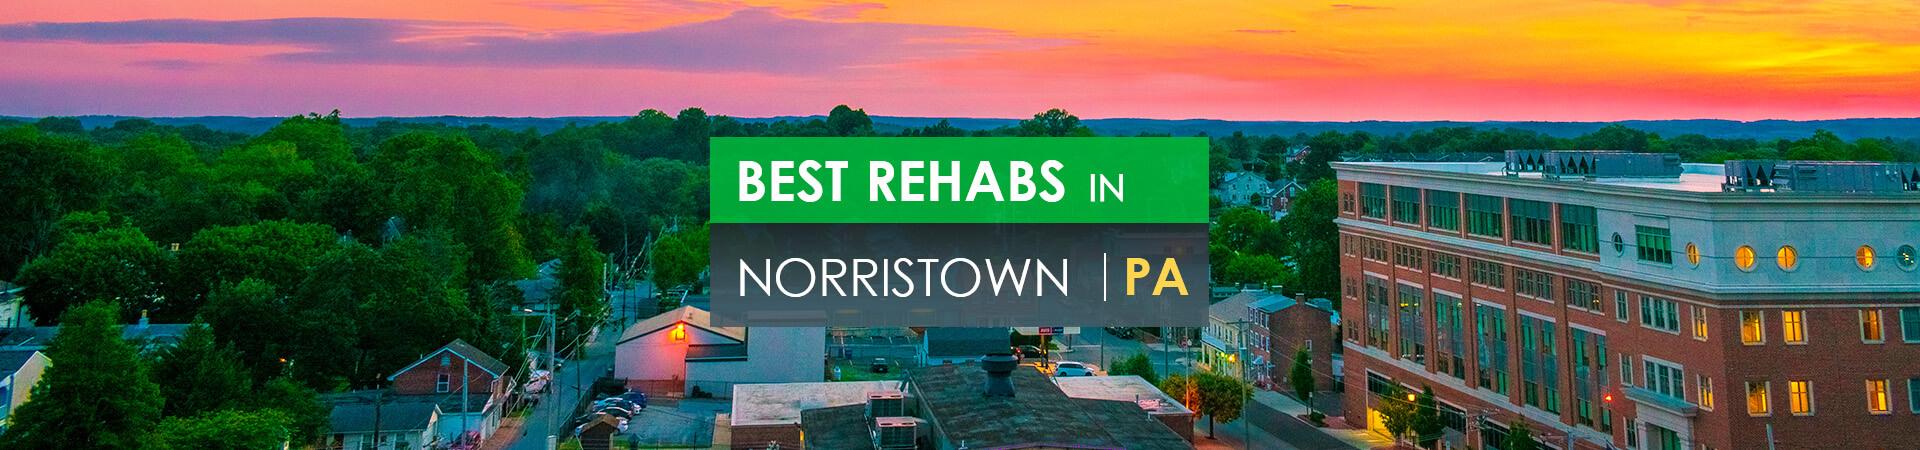 Best rehabs in Norristown, PA